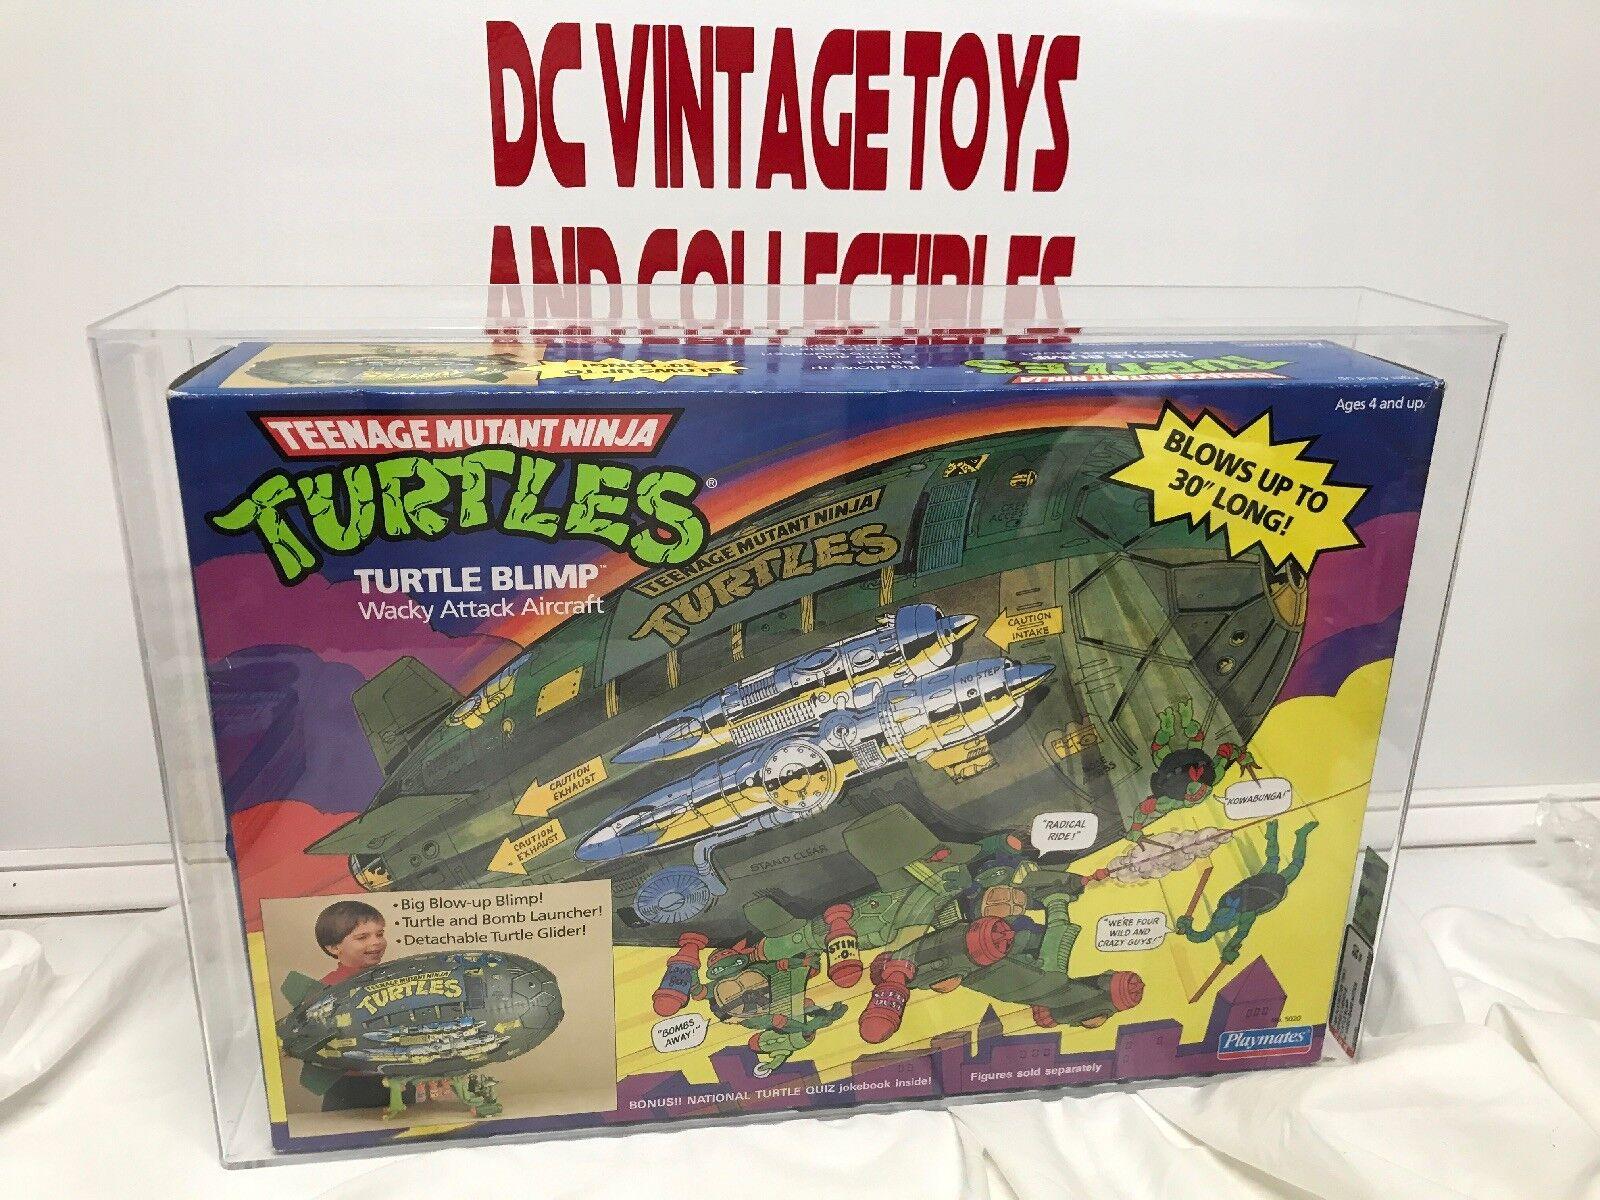 Turtle BLIMP playmates 1989 series 1 AFA GRADED 80 VEHICLE TMNT Video Game Offer